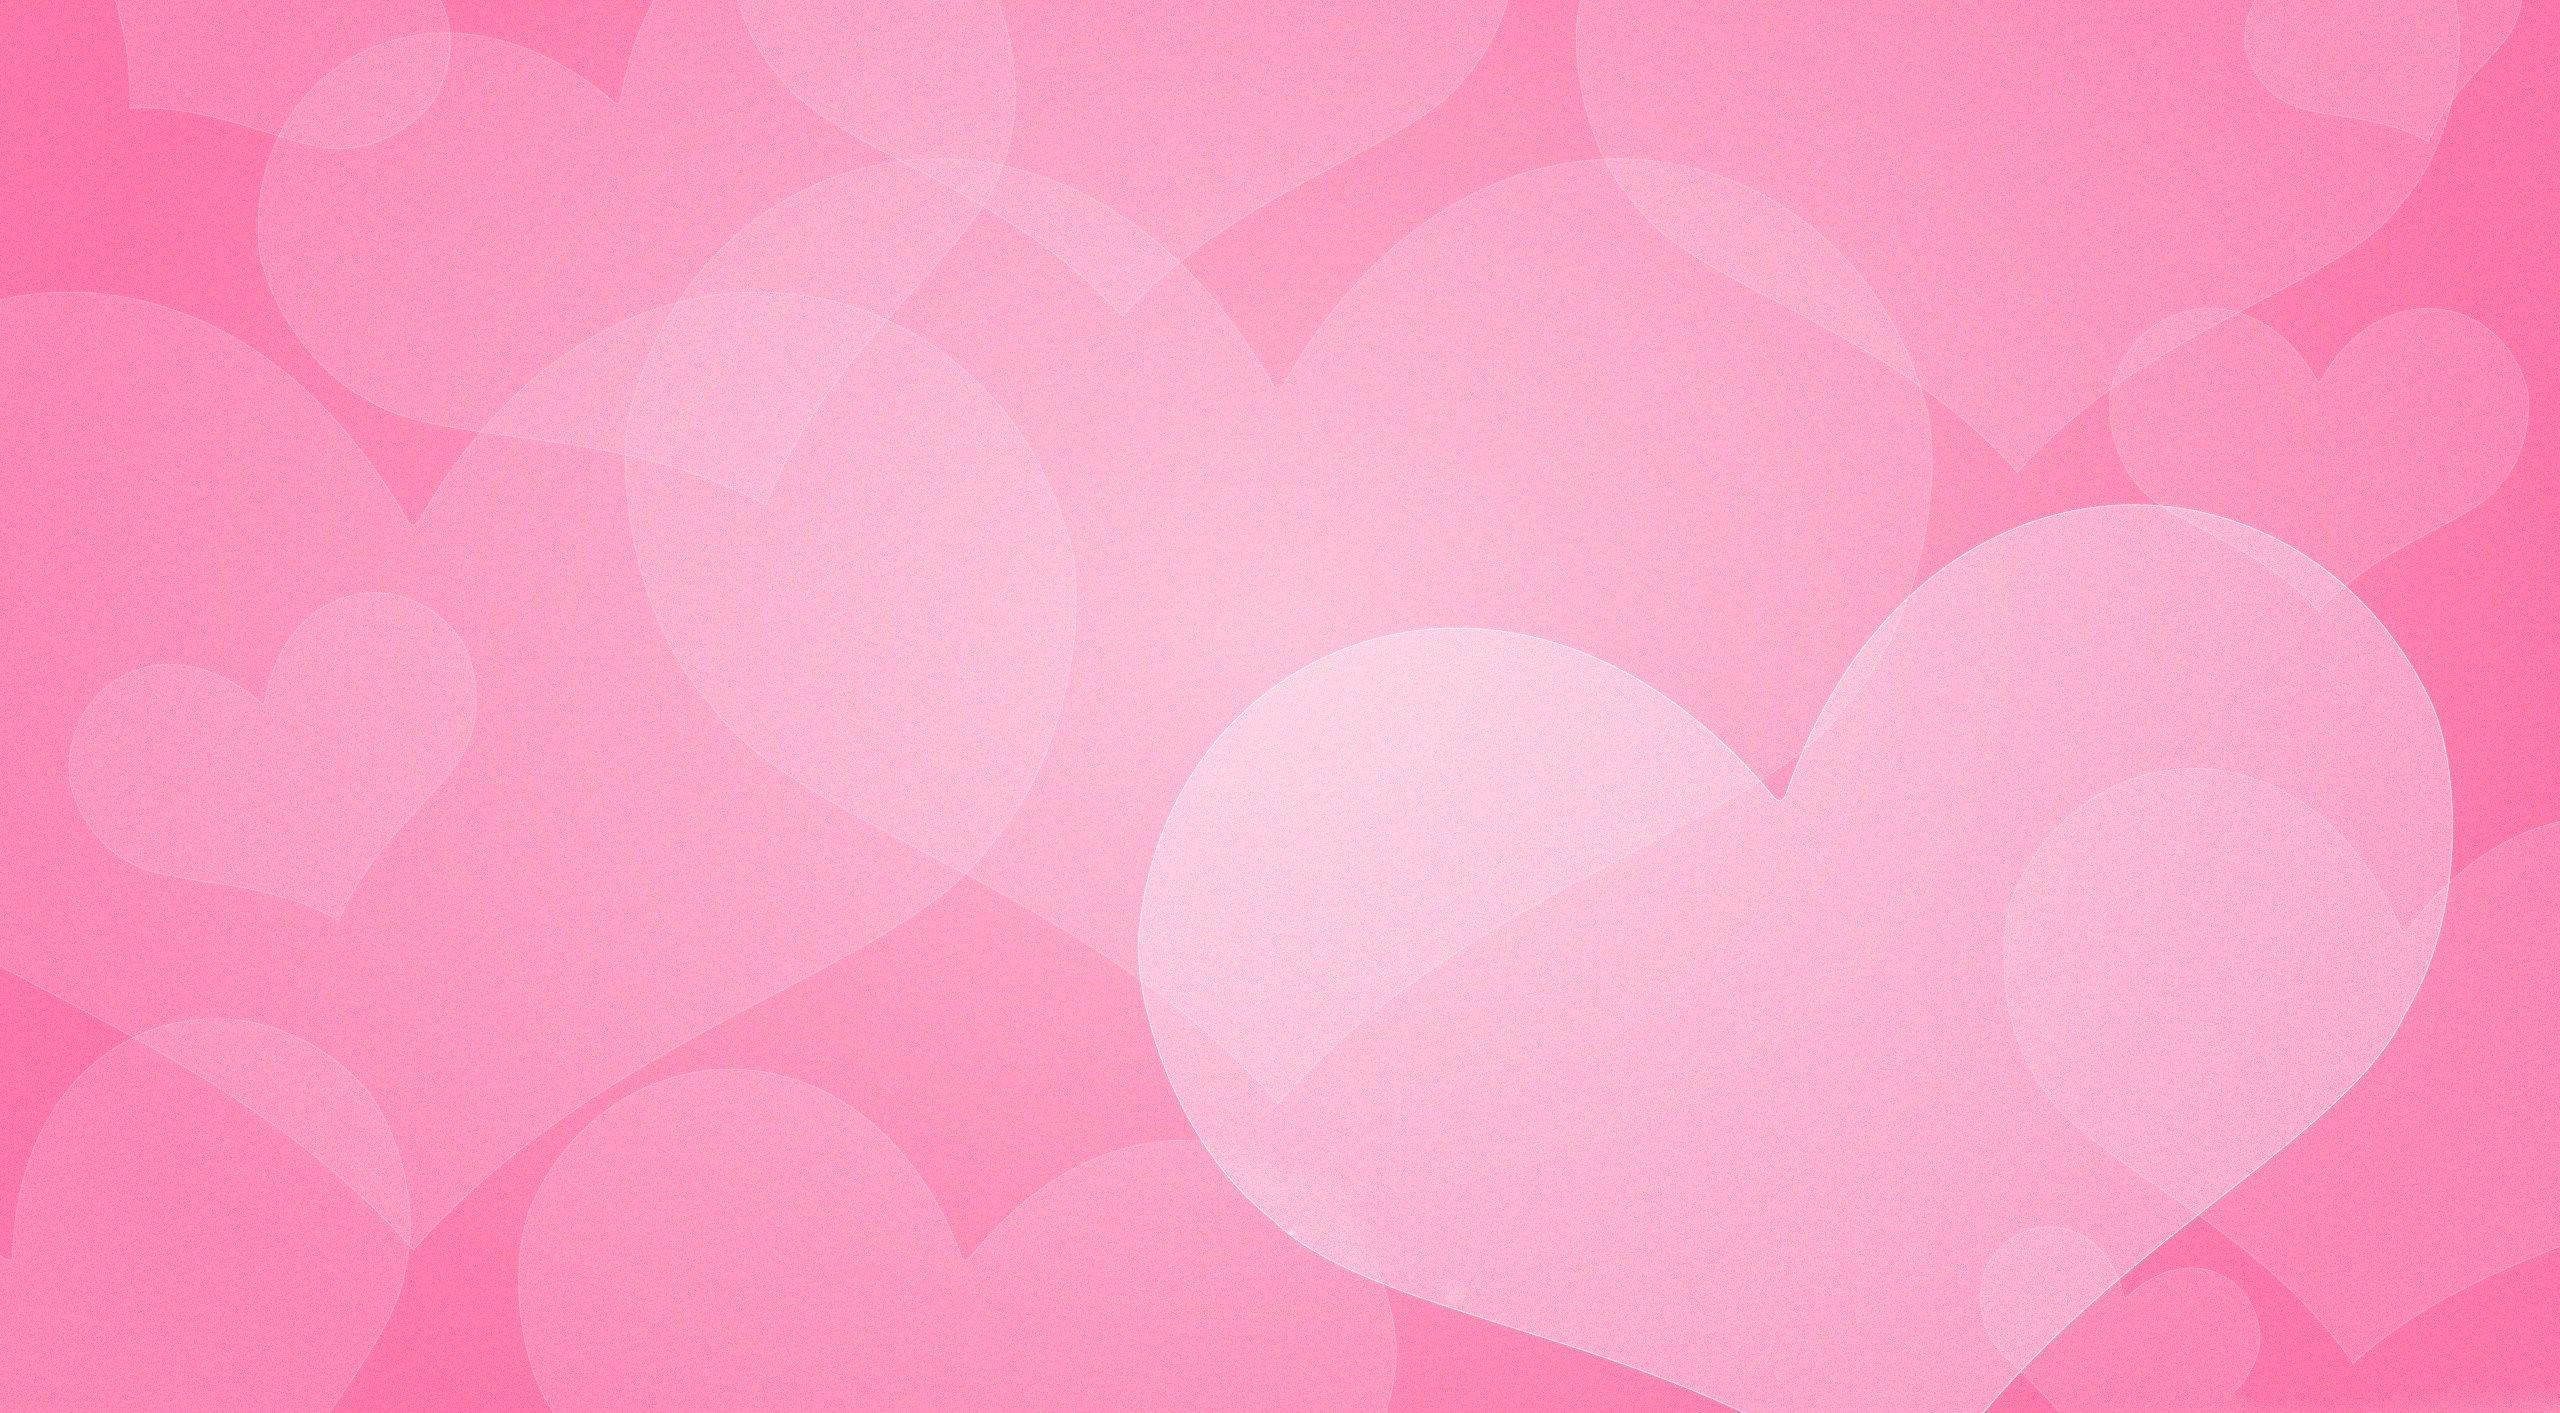 Plain Love Desktop Background Pink Wallpaper Love Wallpaper Valentines Day Background